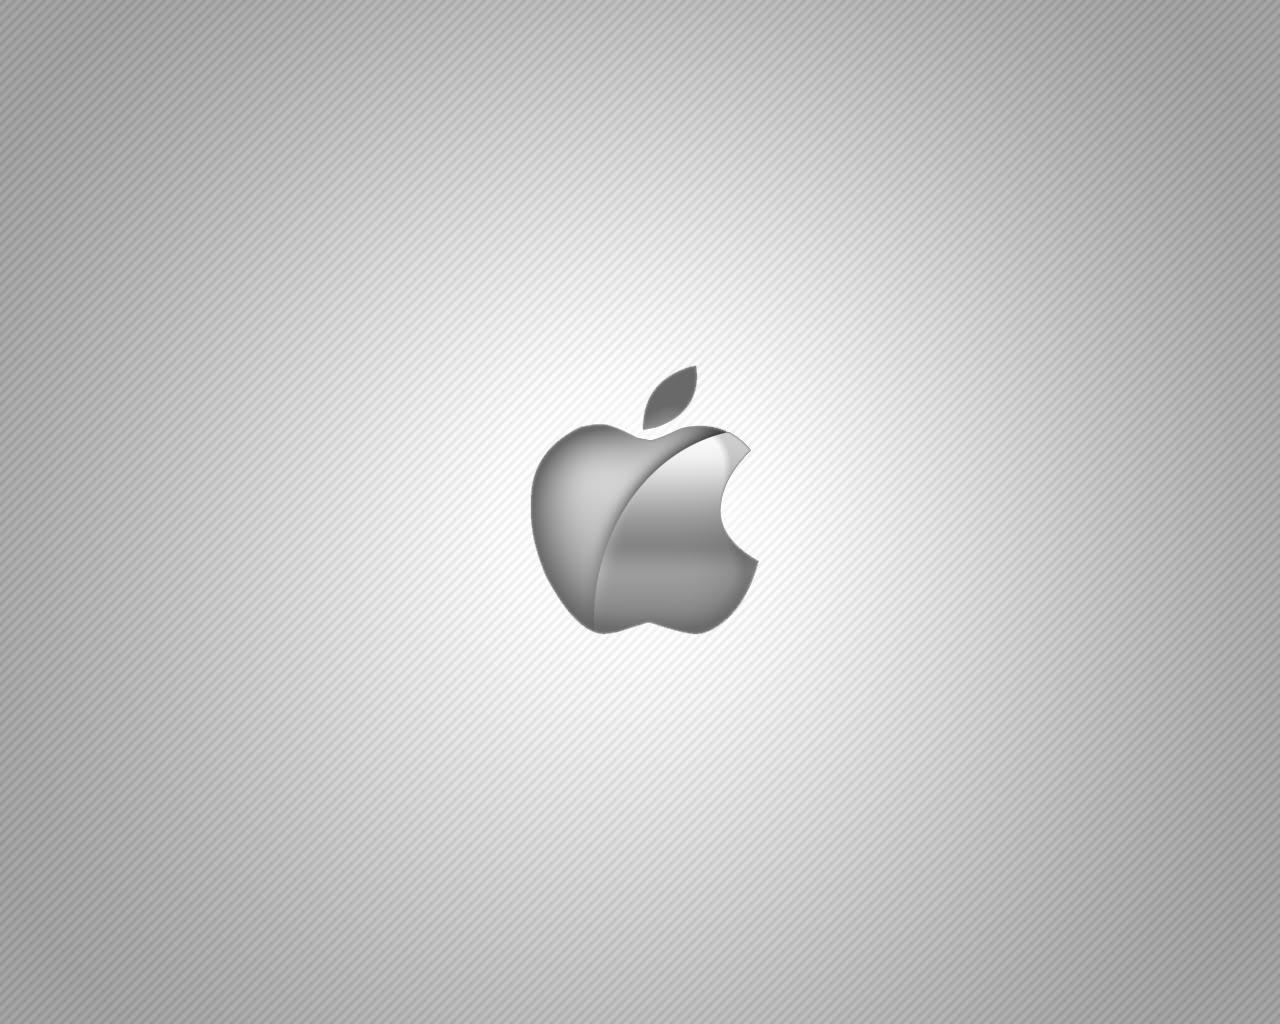 osApple03sg5.jpg